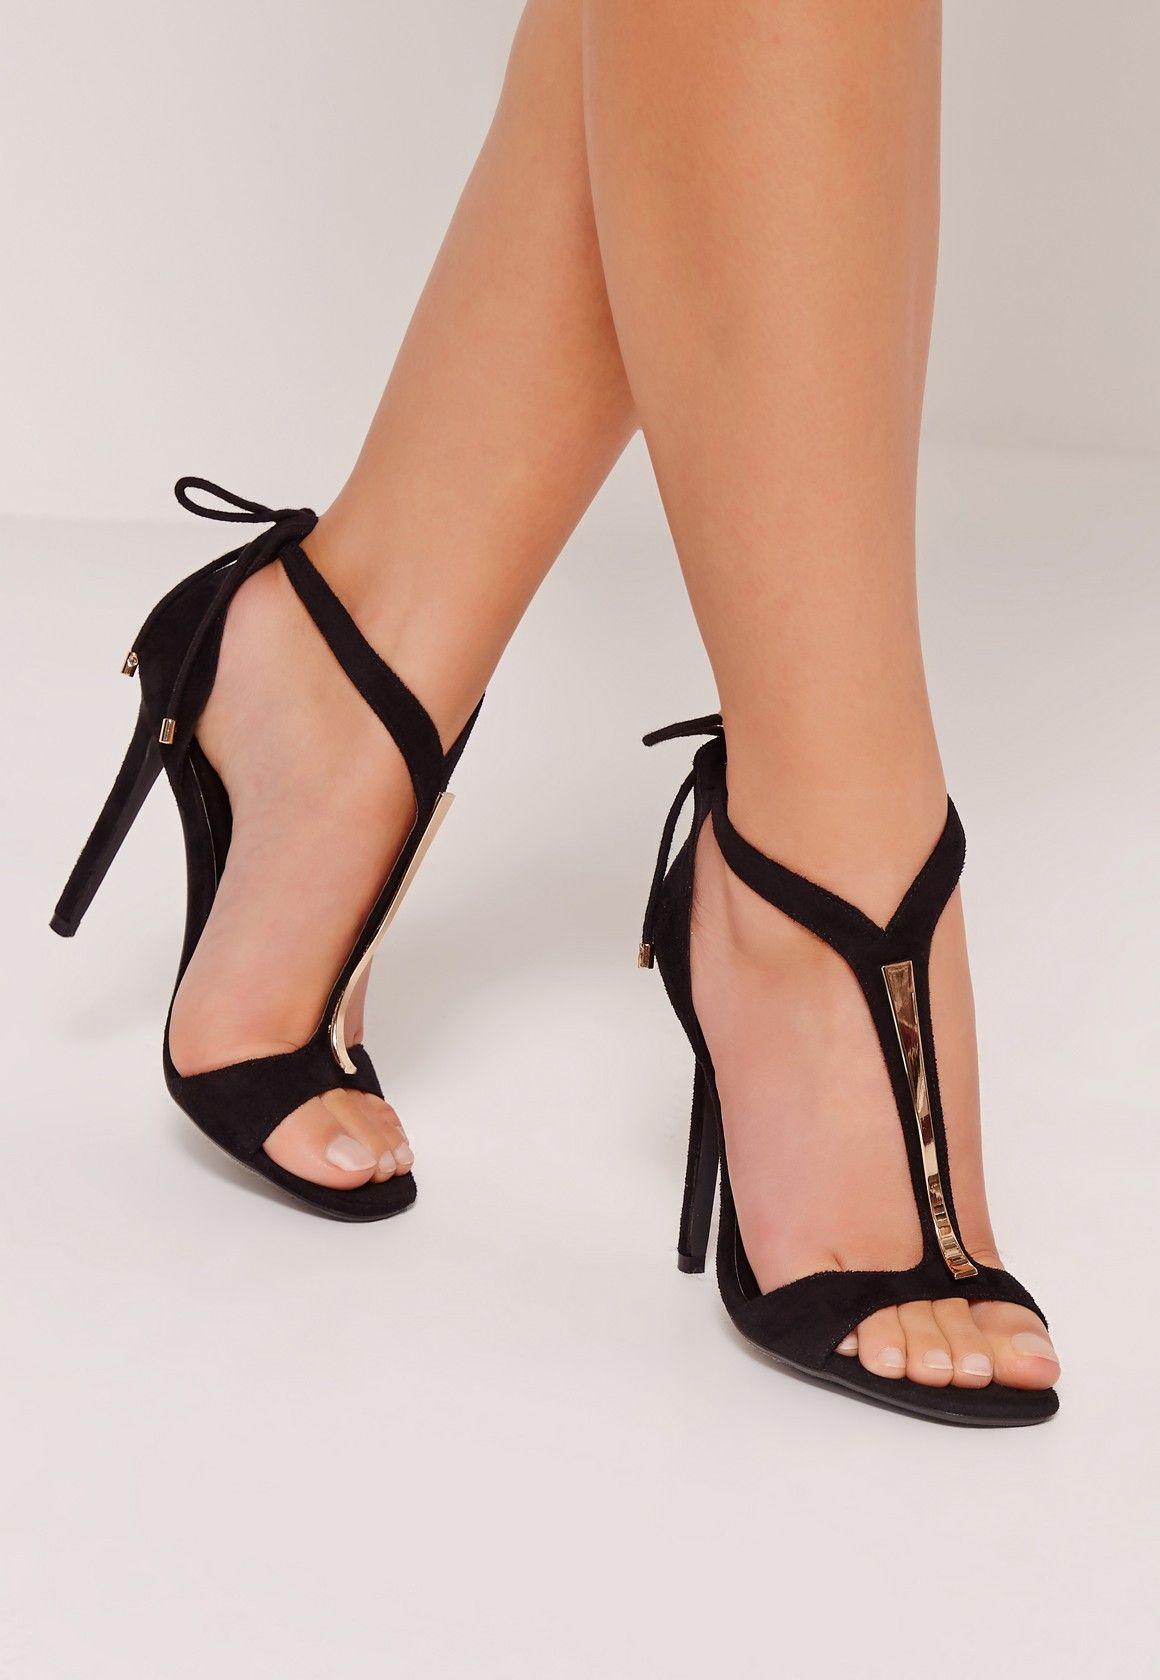 Missguided - Gold Trim T-Bar Heeled Sandals Black